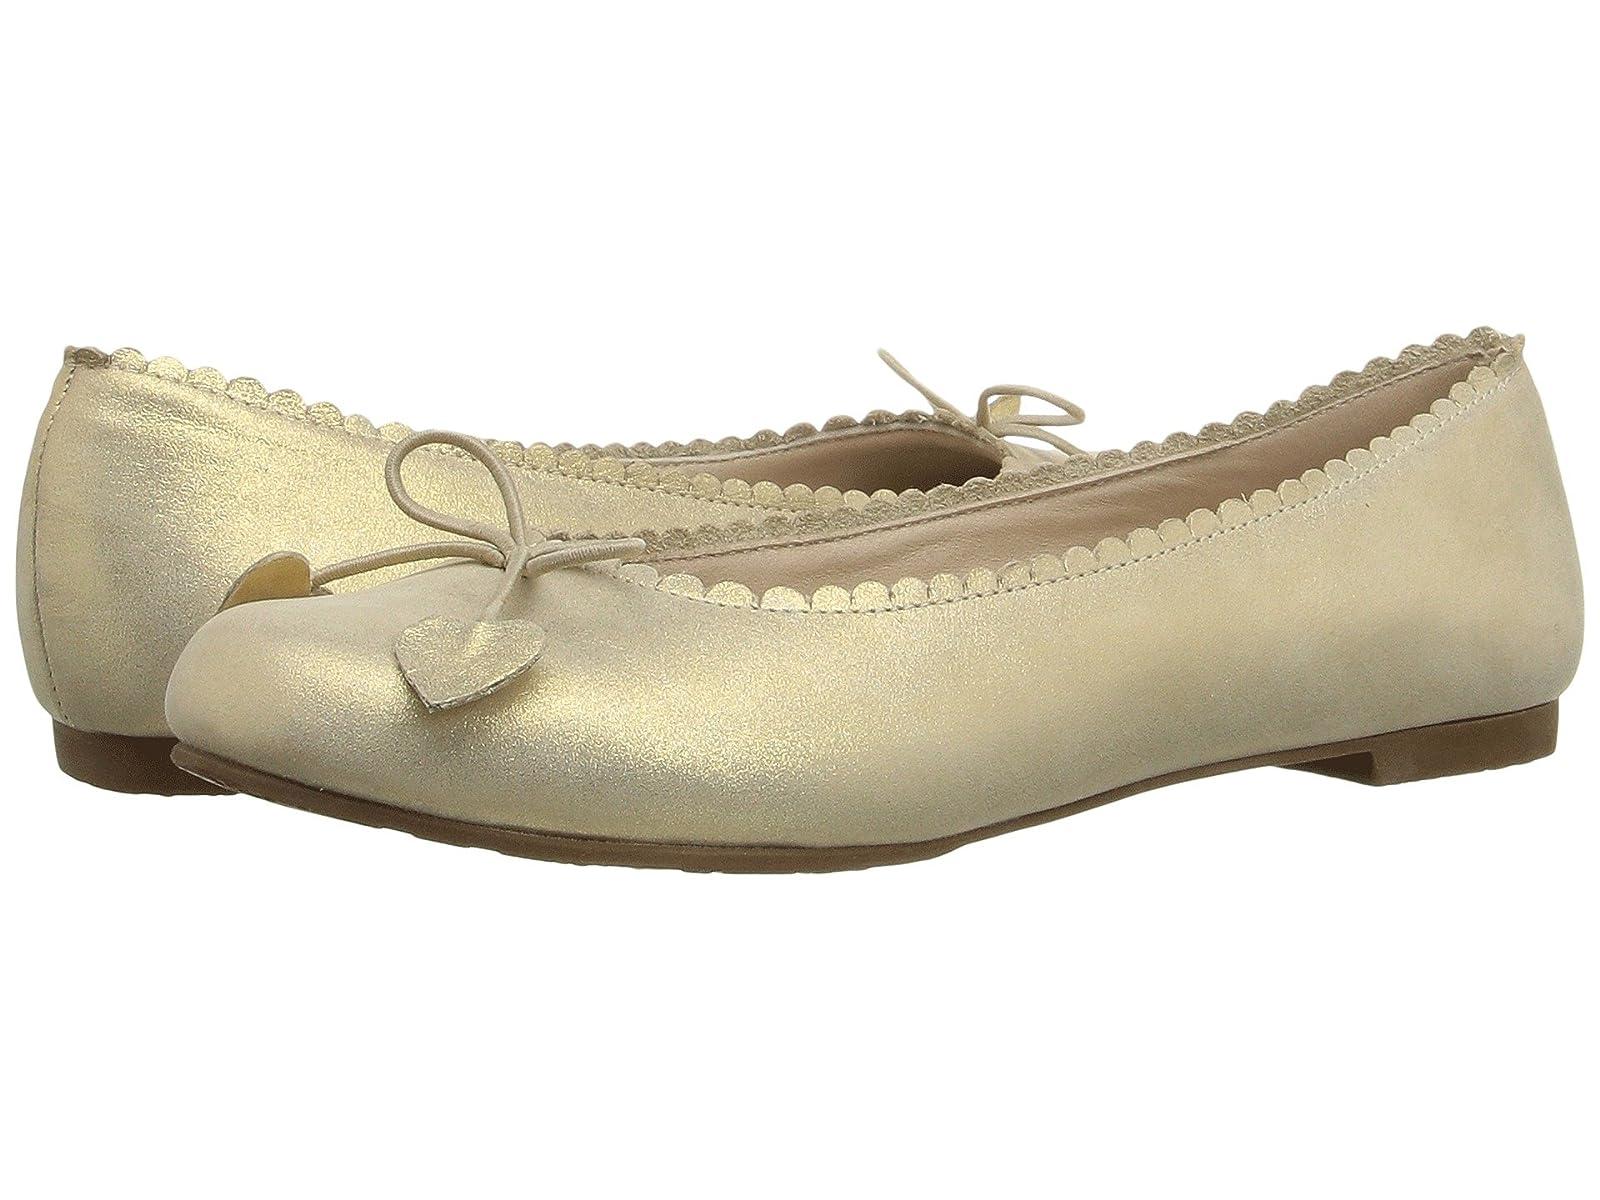 Elephantito Scalloped Ballerina (Toddler/Little Kid/Big Kid)Atmospheric grades have affordable shoes